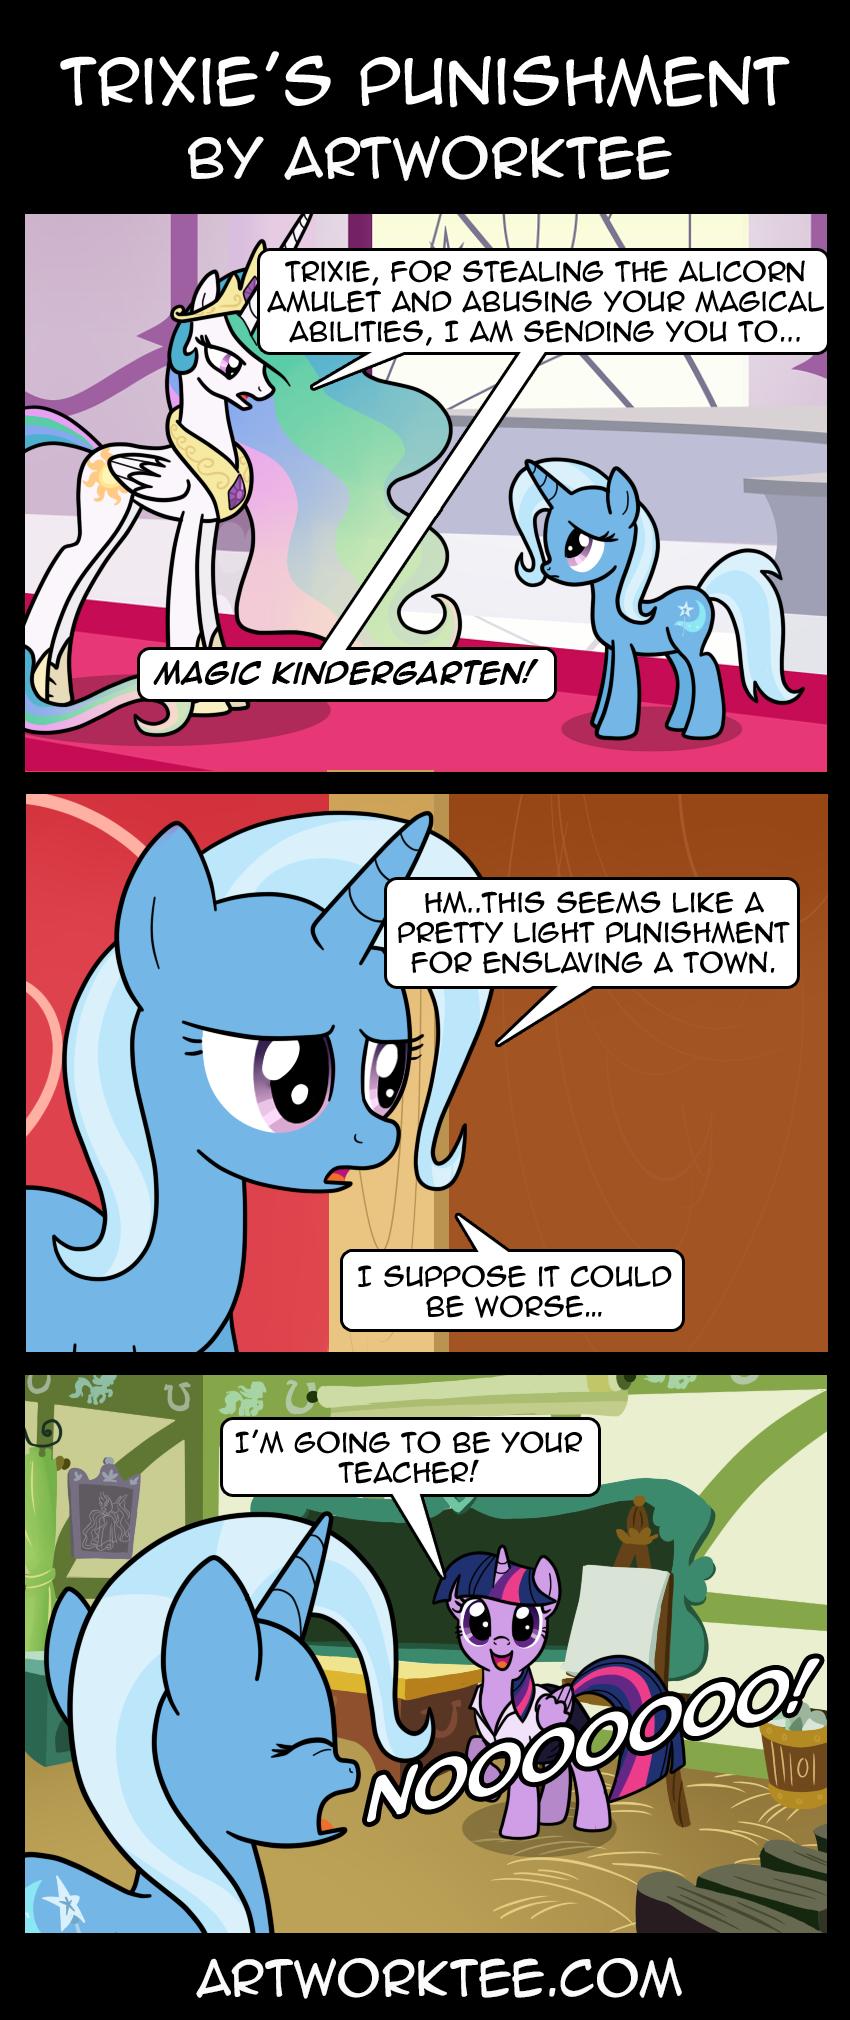 Trixie's Punishment